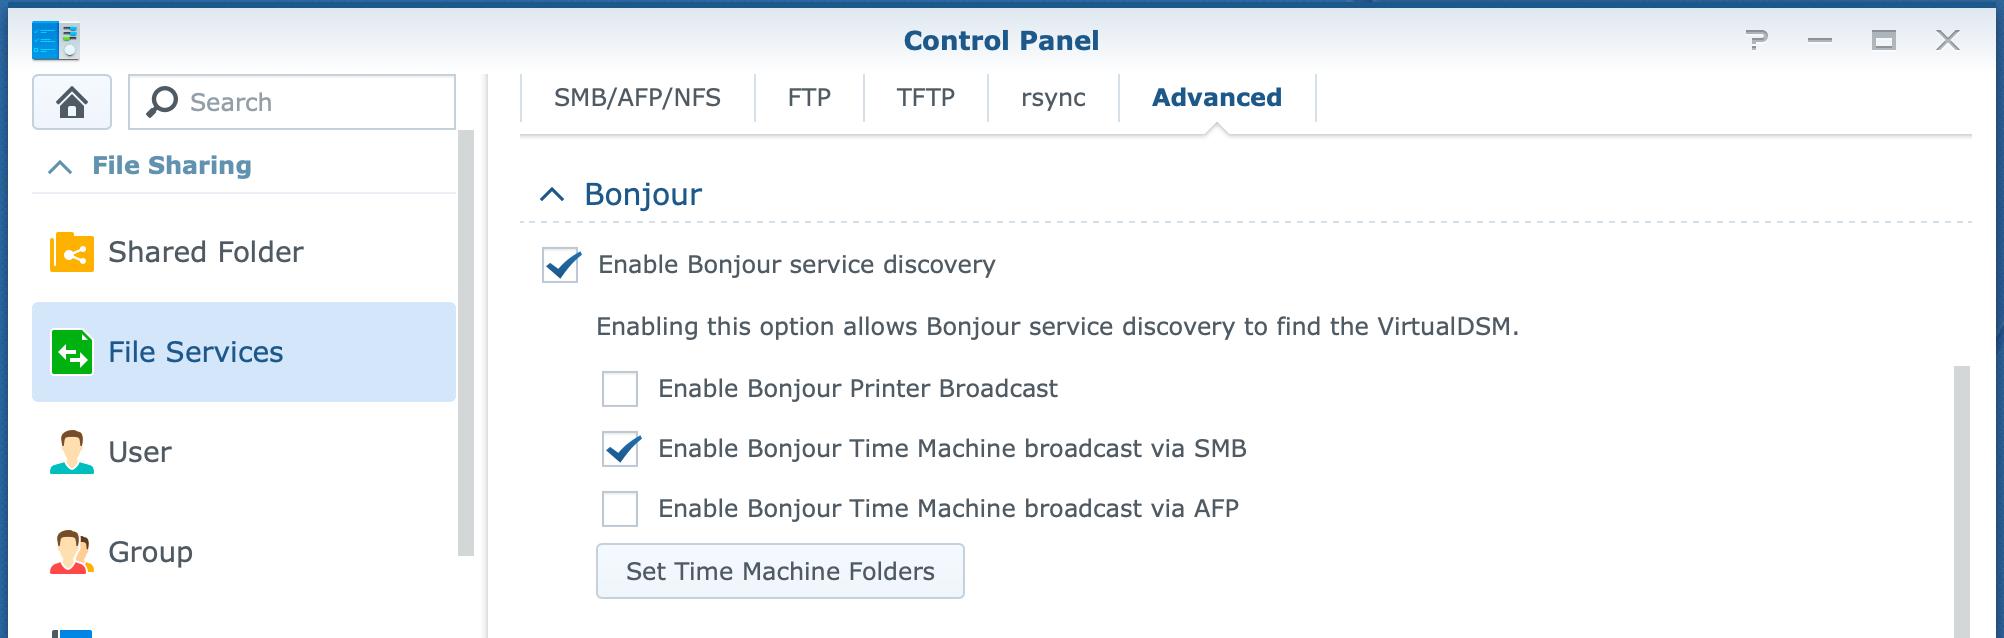 synology, control panel, file services, smb, bonjour, dsm6